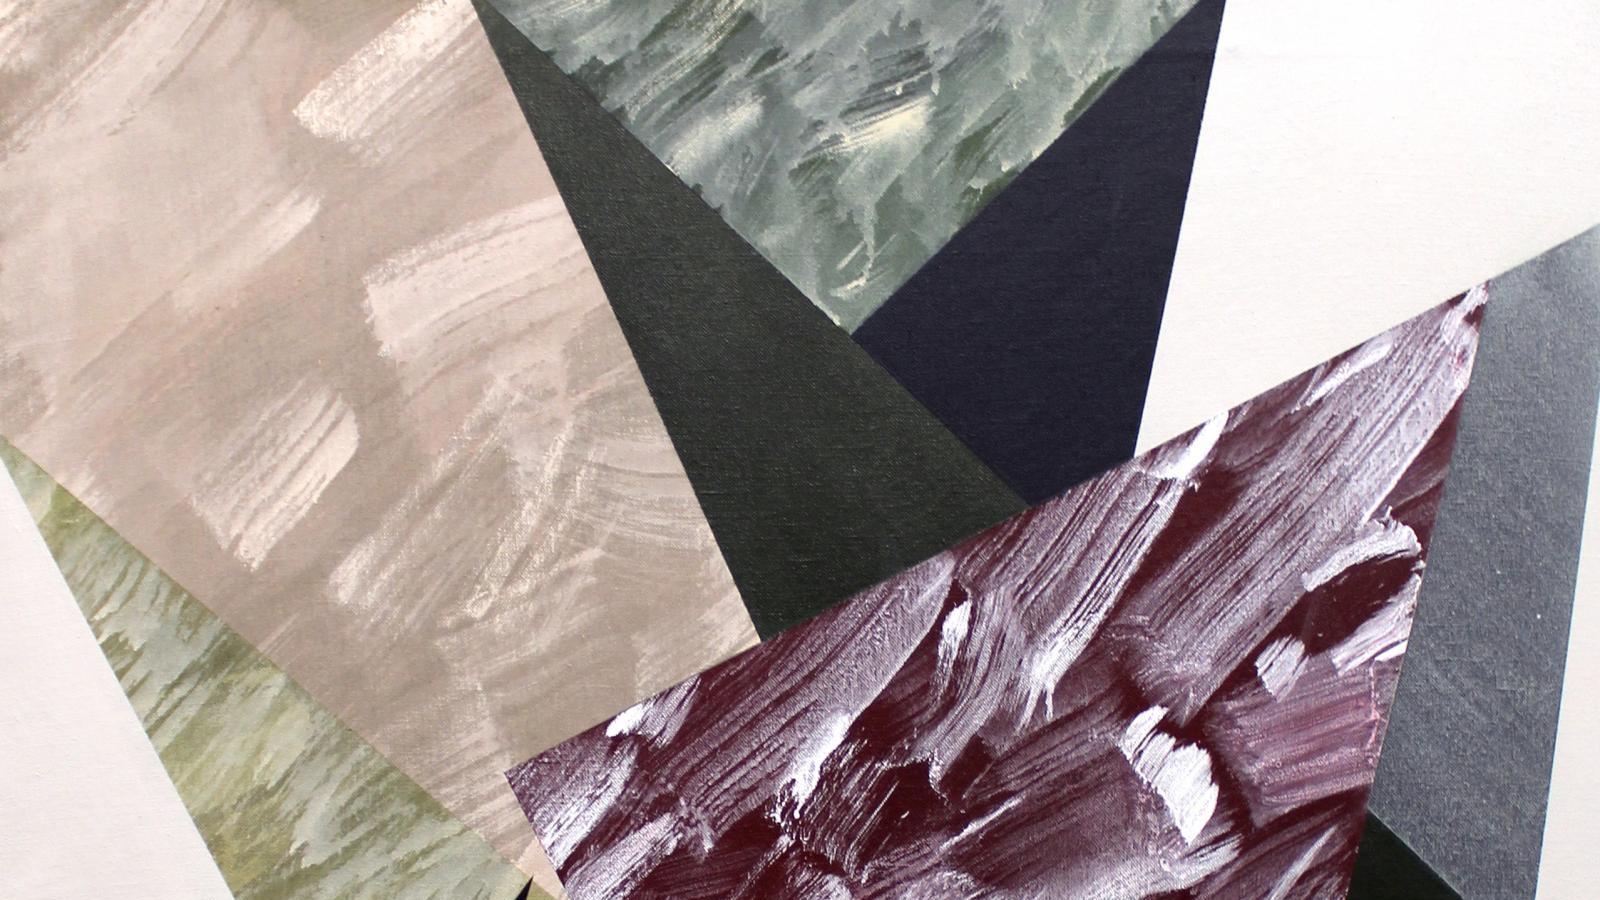 Buraindo , Acrylic on fabric, 100 × 85 × 3 cm